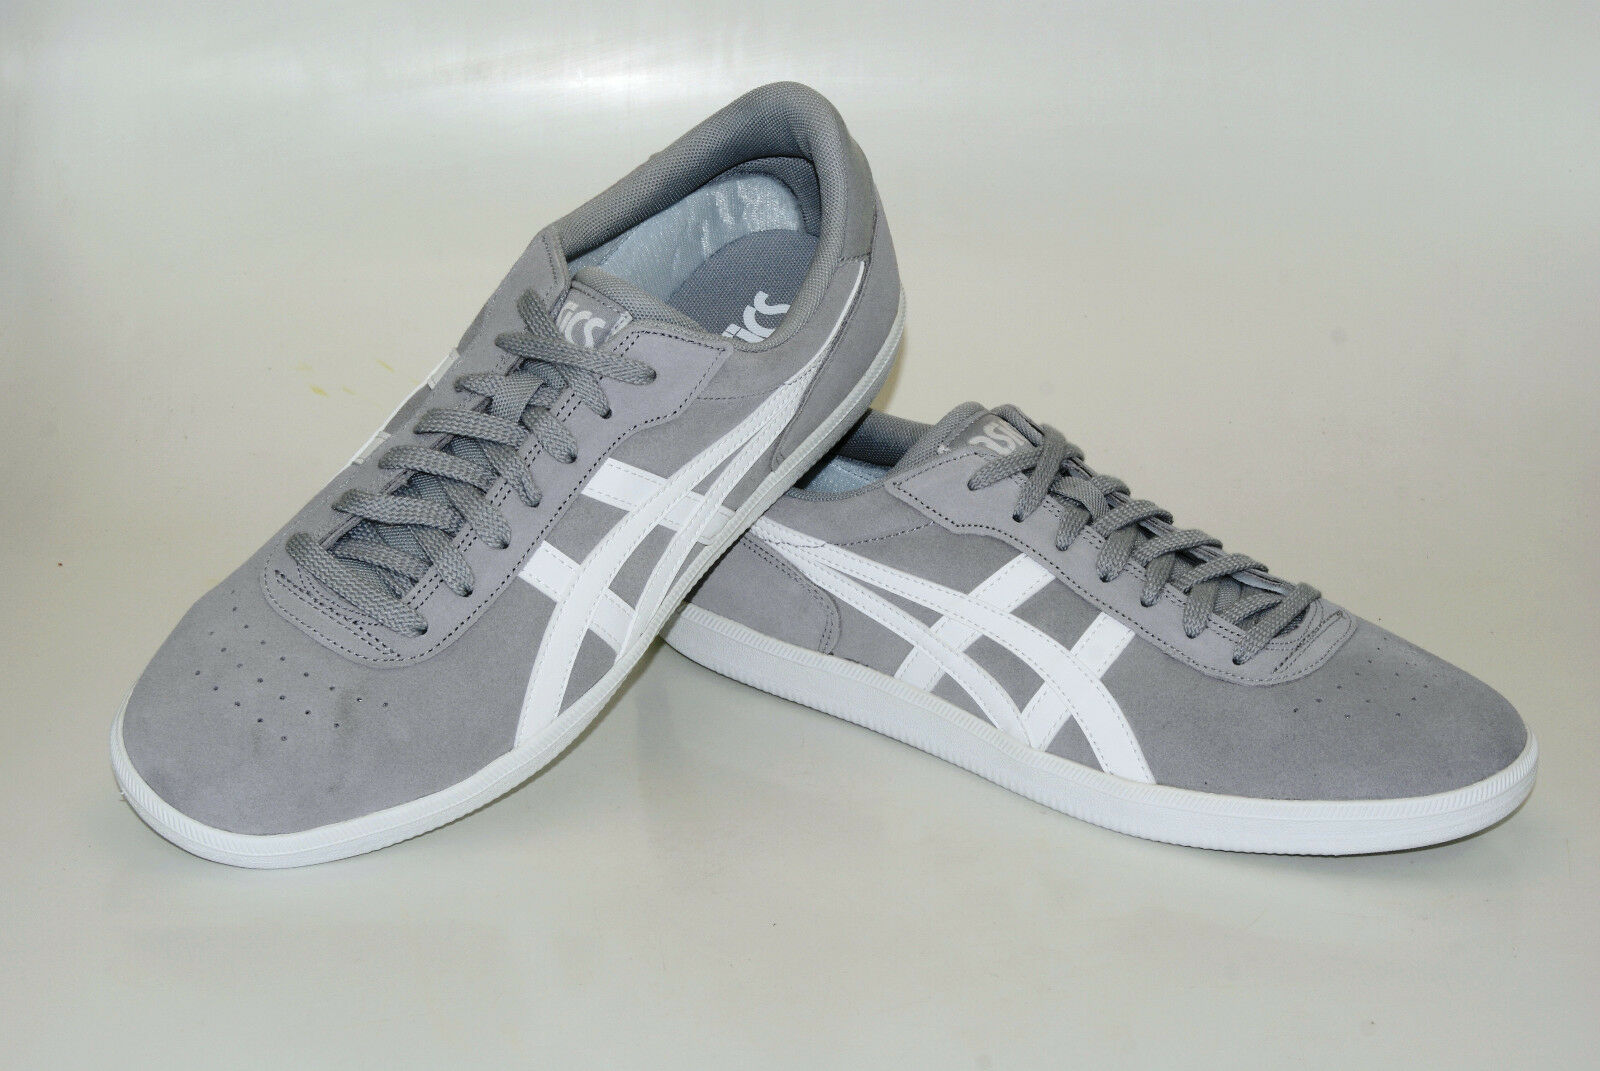 Asics Turnschuhe Percussor TRS Sneakers Turnschuhe Asics Sportschuhe Herren Schuhe HL7R2-9601 854698